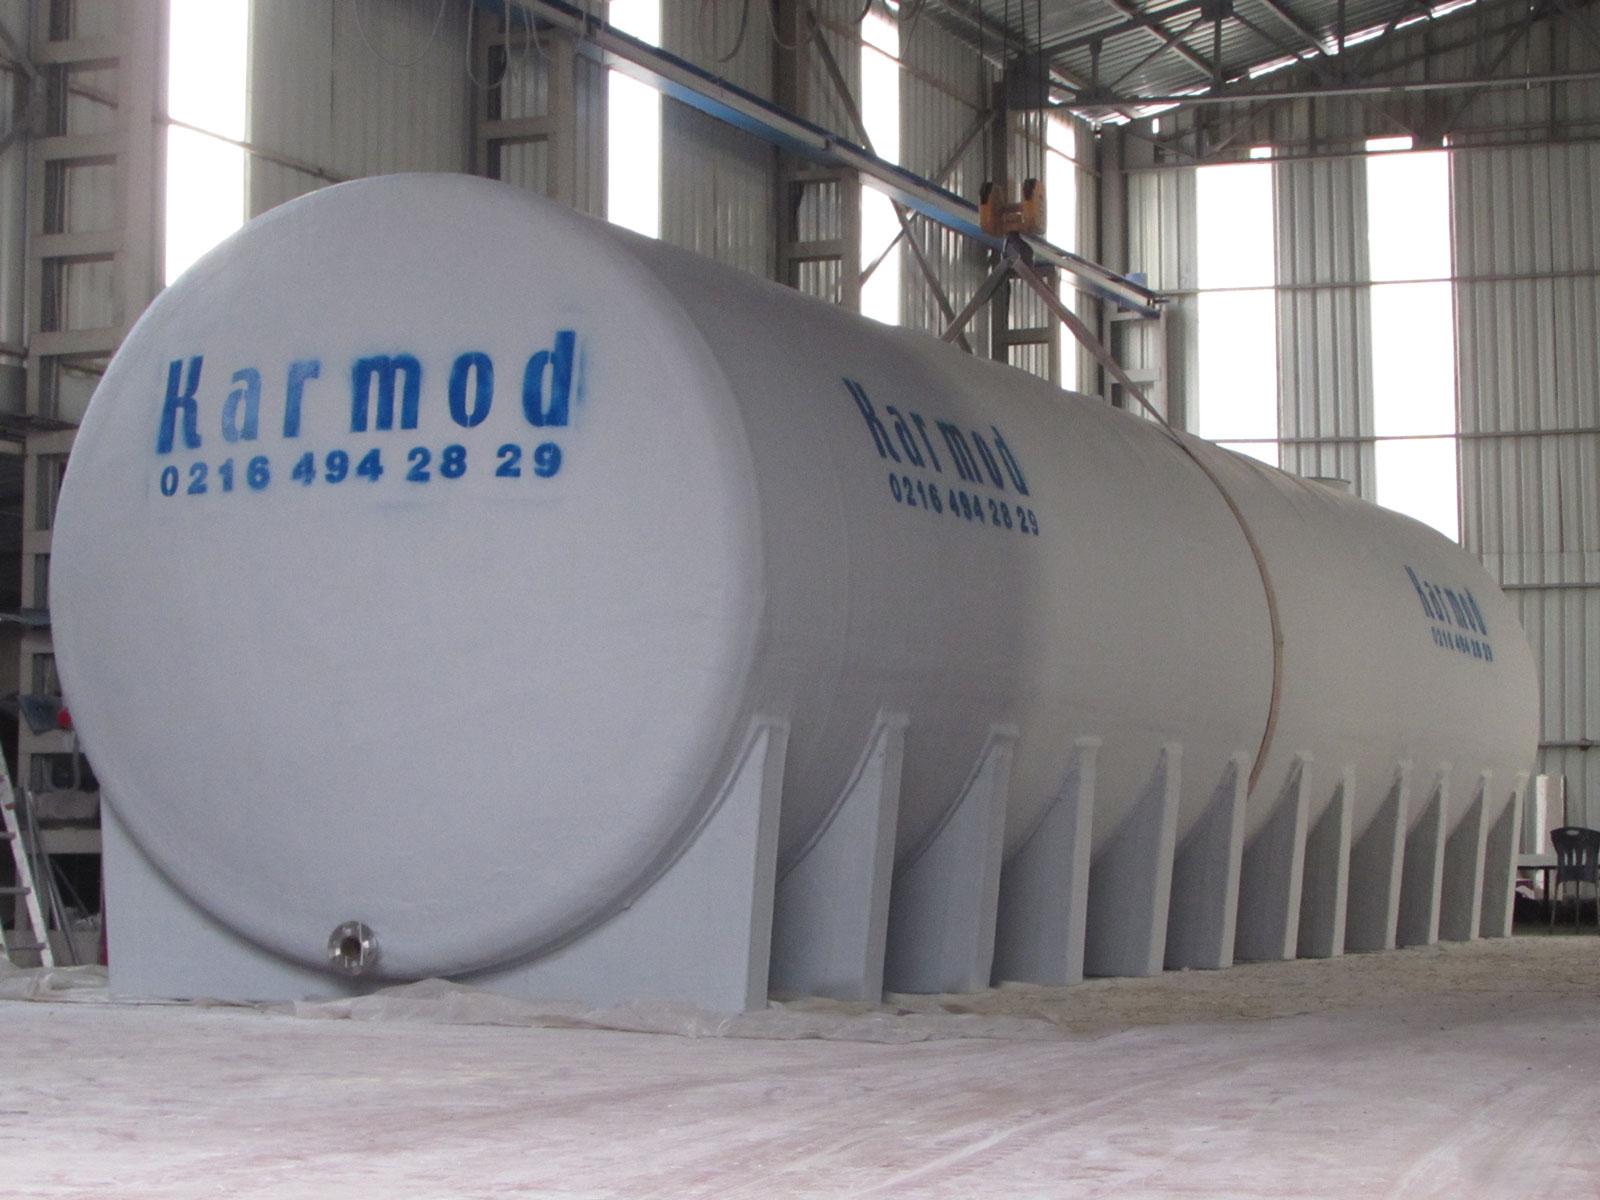 Karmod 100 Ton Depolar 0216 494 28 29